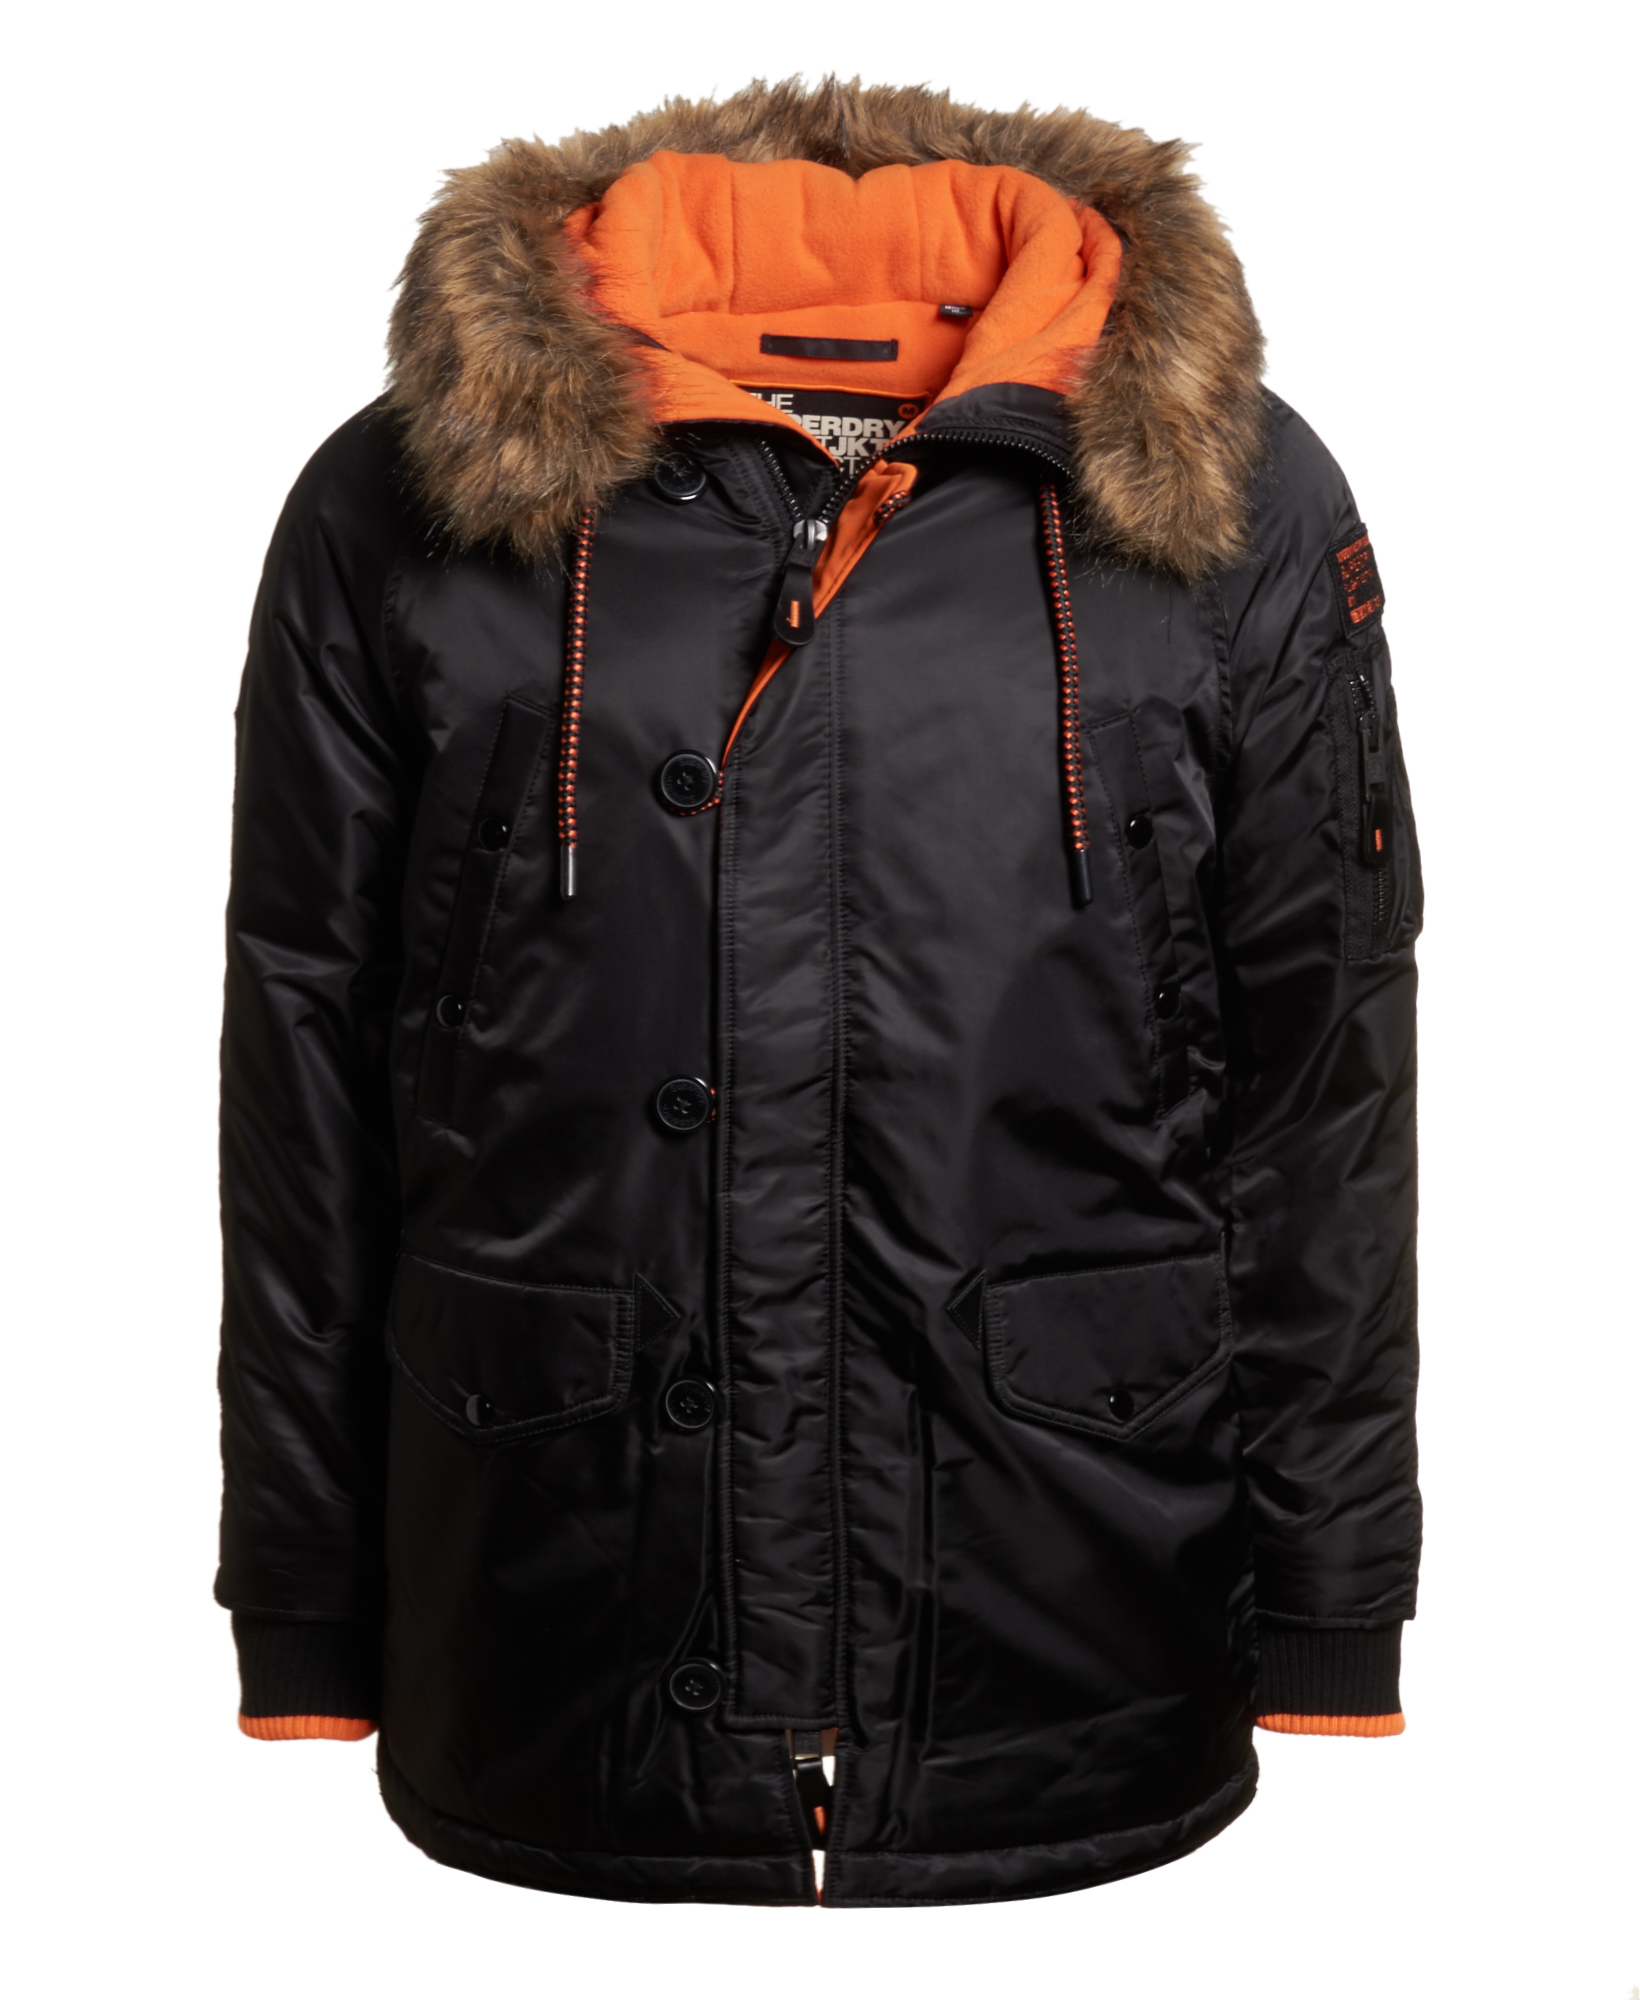 a5c876efaa2 Details about New Mens Superdry Sd-3 Parka Coat Black